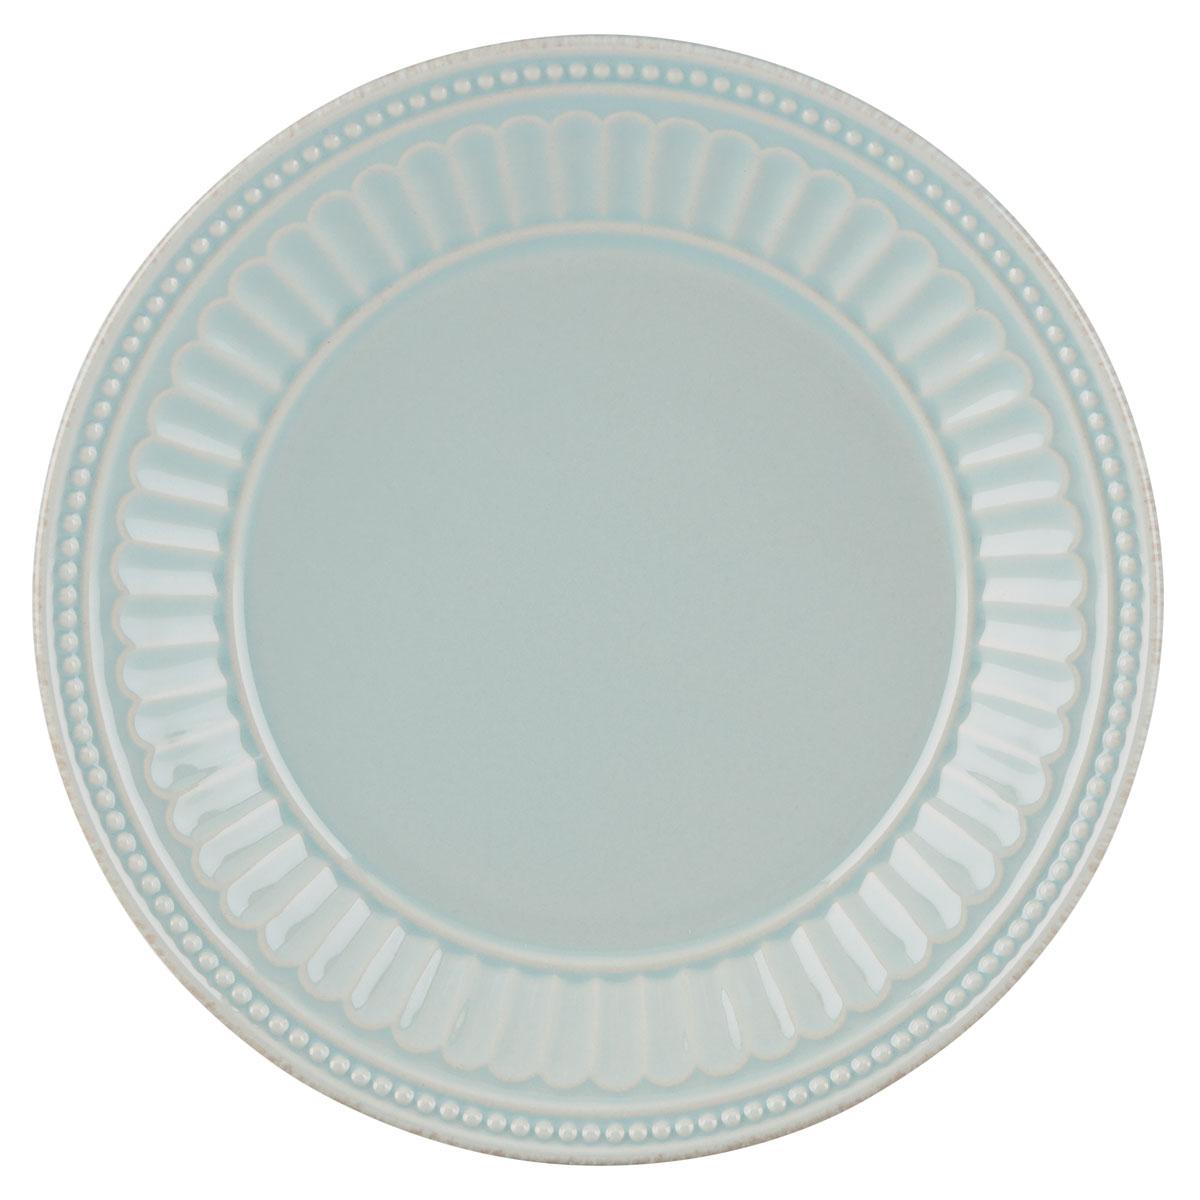 Lenox French Perle Groove Ice Blue Dinnerware Dessert Plate